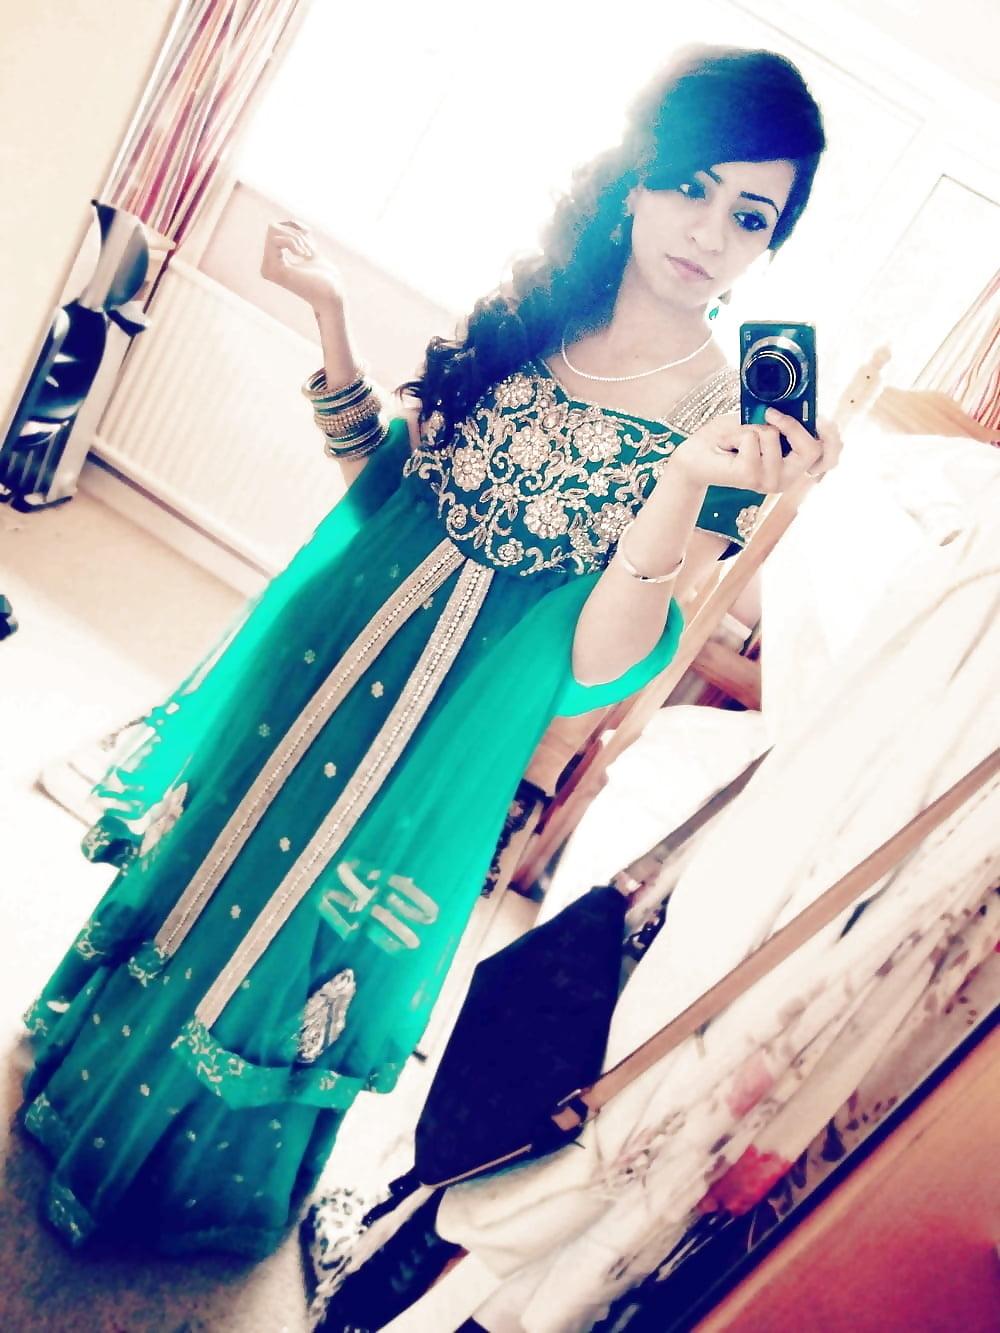 Sexy Paki Indian Teen Selfshot boobs Hot Girl 2 - Sexy Paki Indian Teen Selfshot boobs Hot Girl